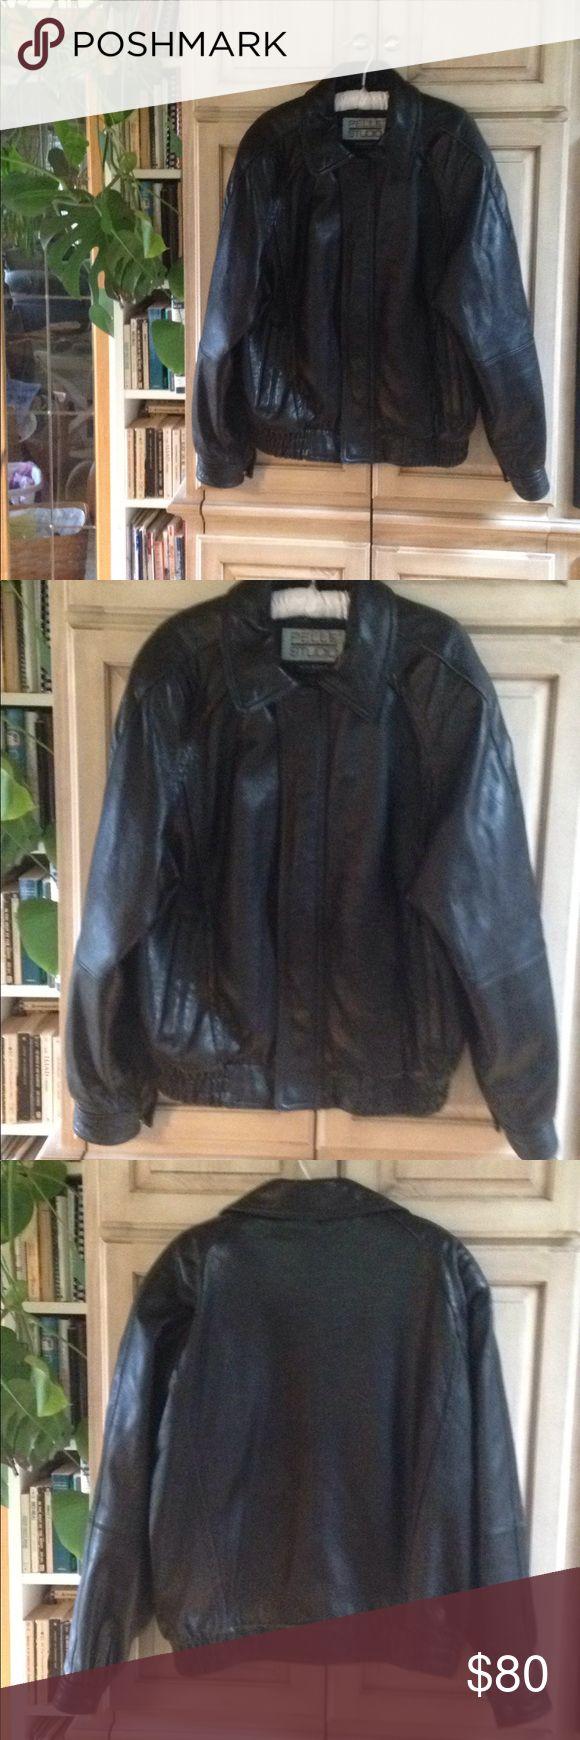 Wilson Leather Pelle Studio men's coat EUC Pelle studio